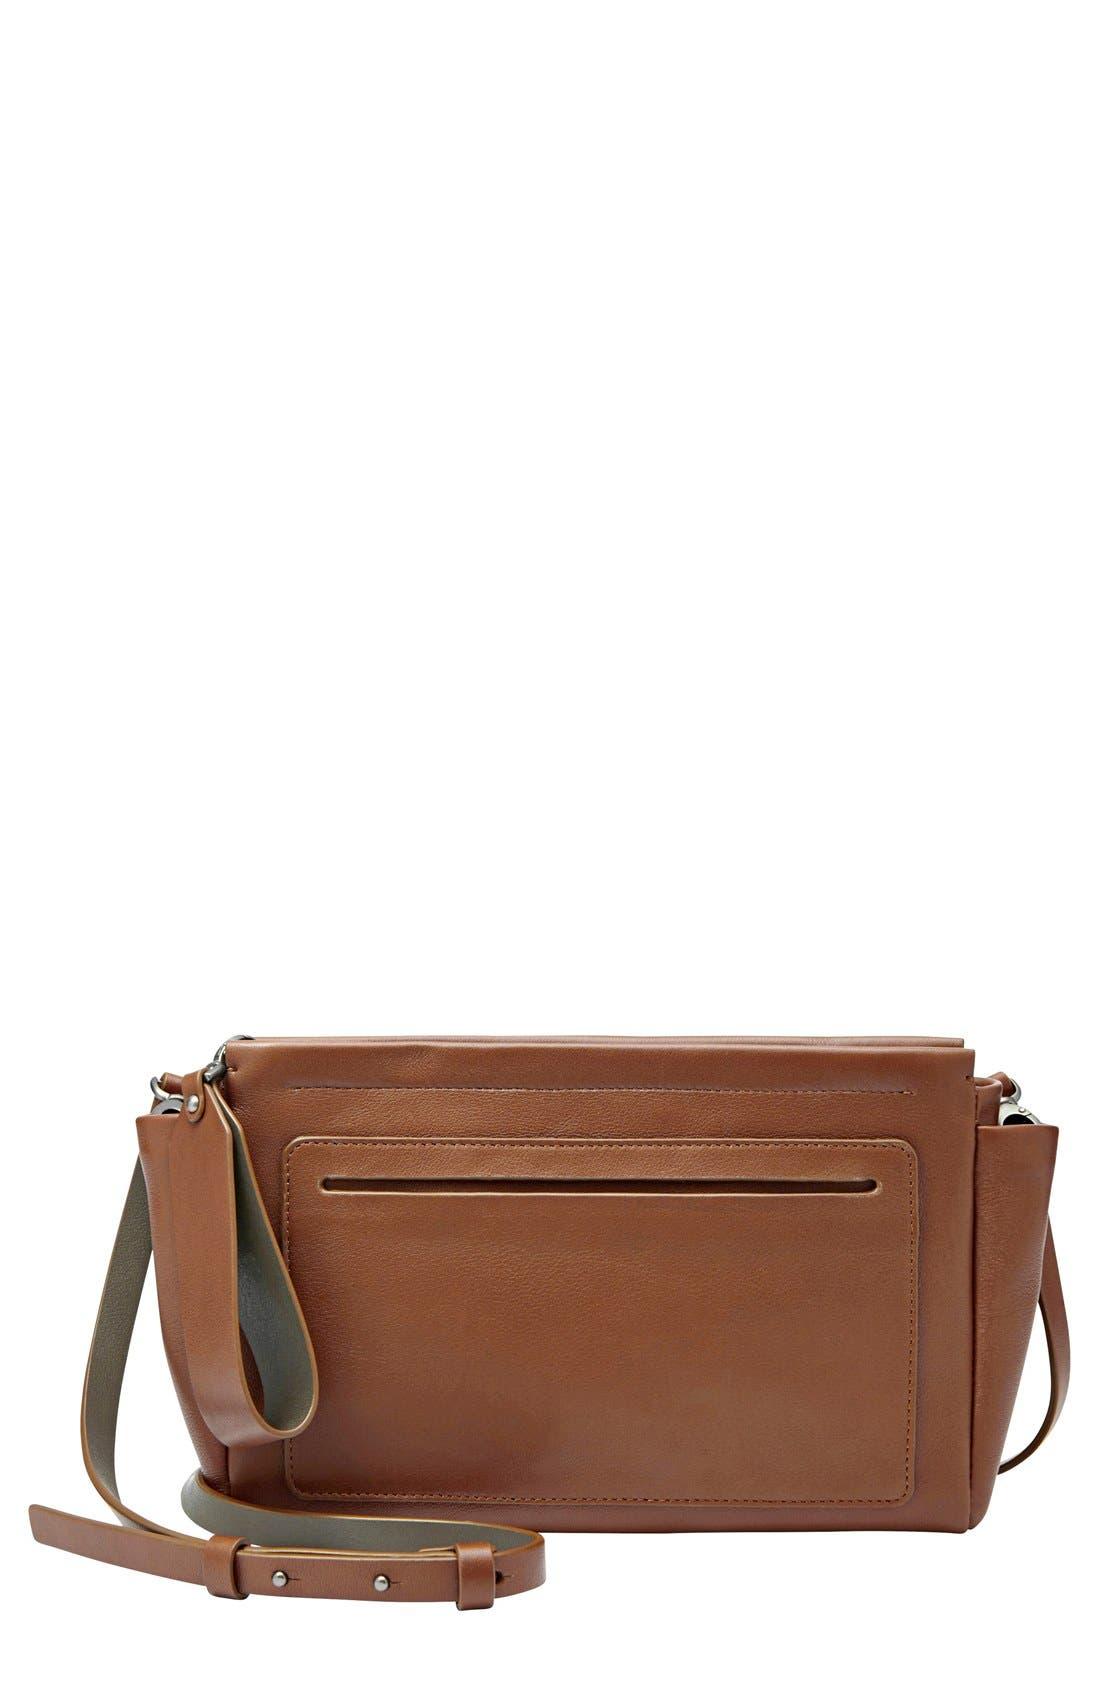 Main Image - Skagen 'Dorte' Convertible Crossbody Bag